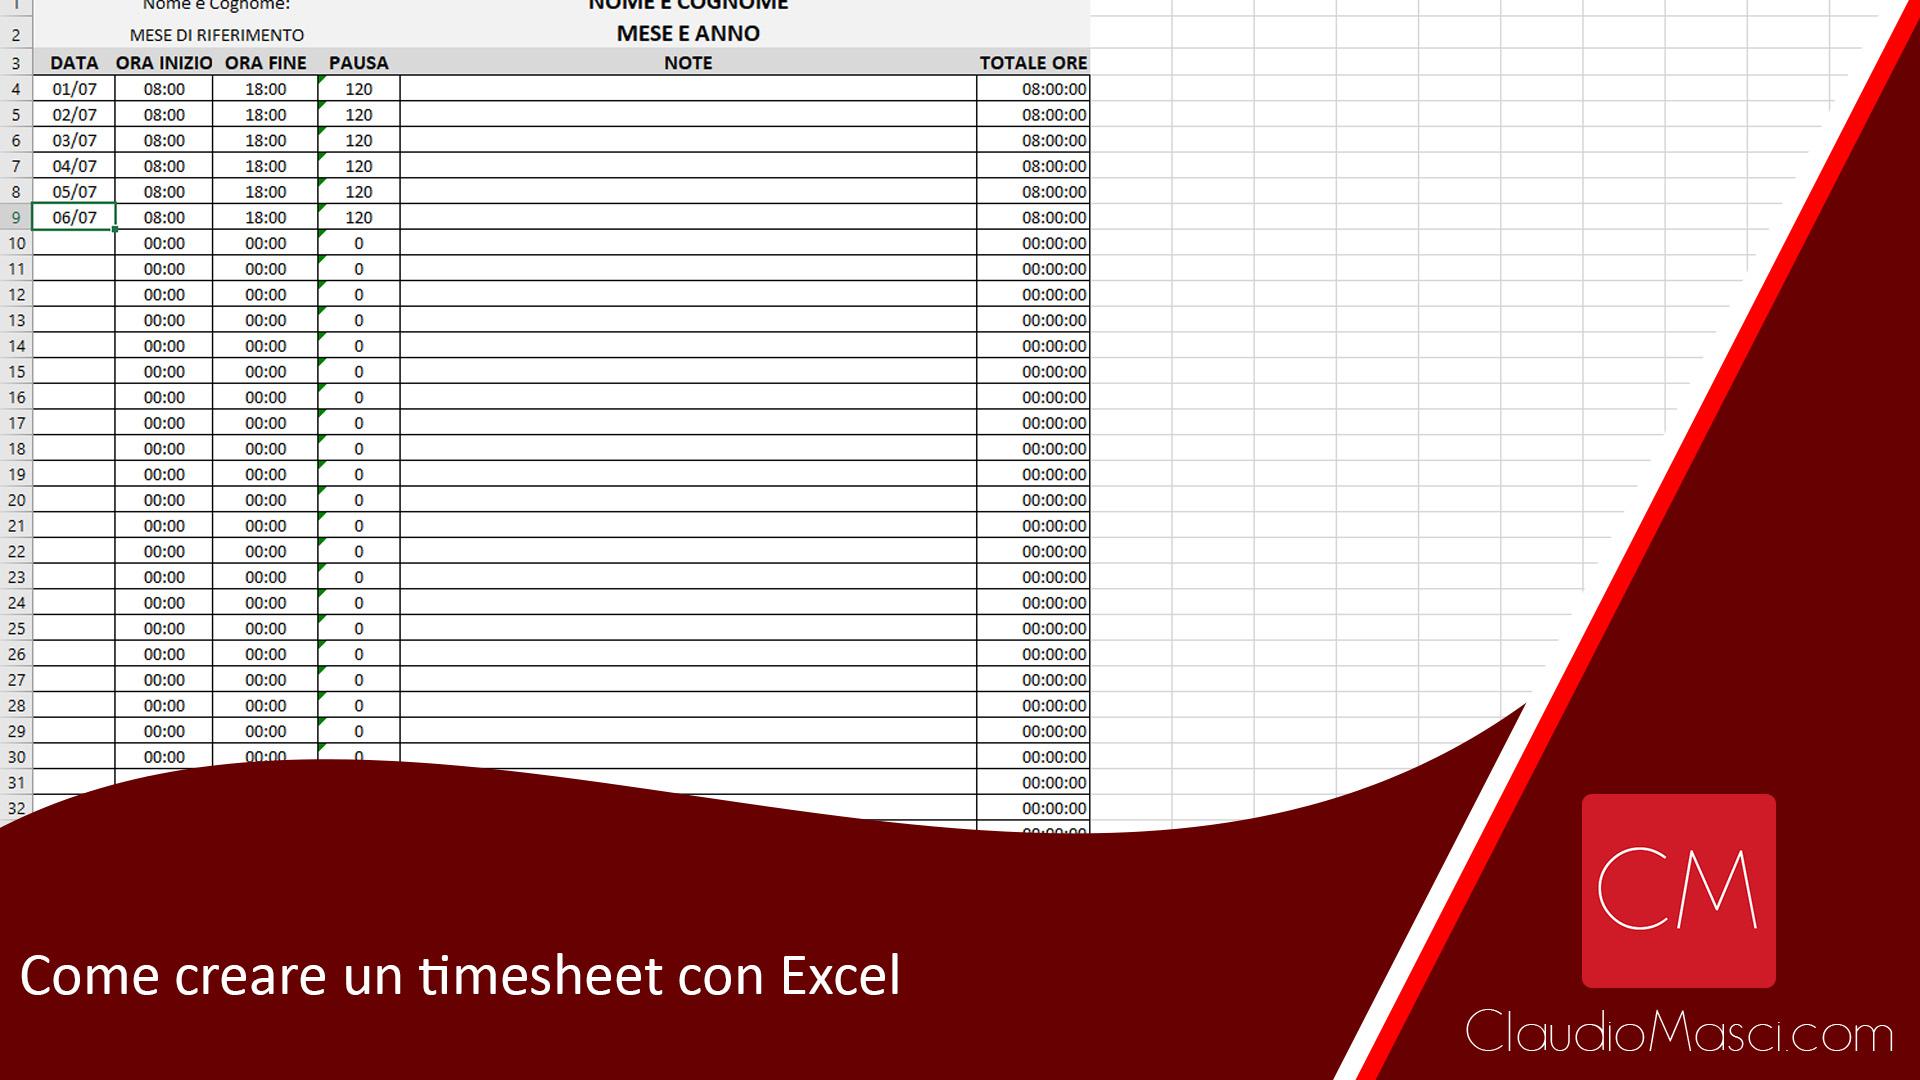 Come creare un timesheet con Excel